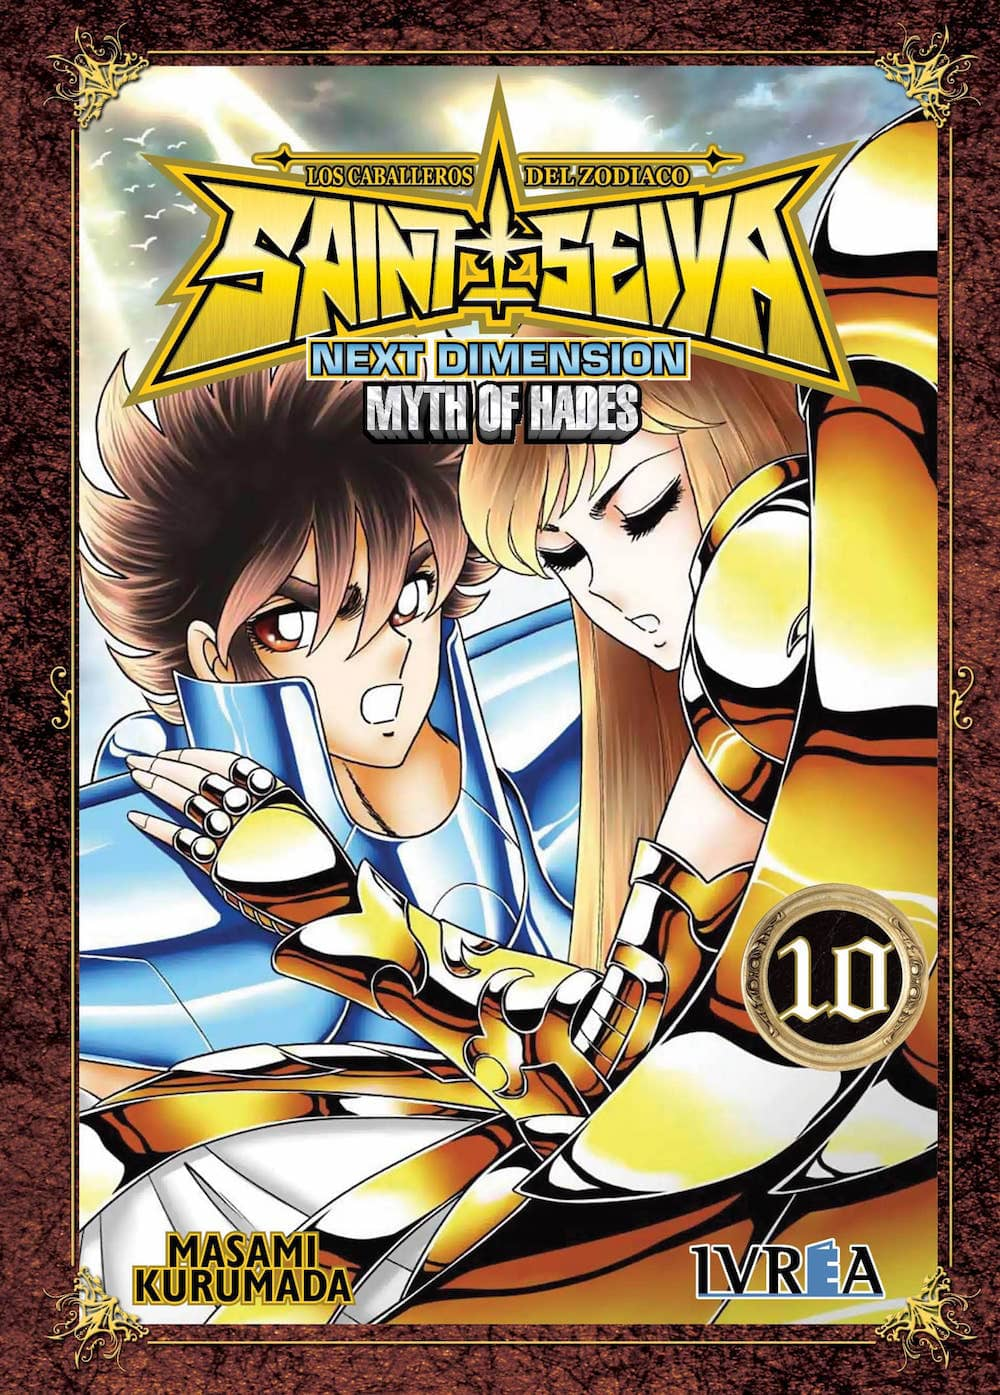 Saint Seiya. Next Dimension: Myth of Hades #10